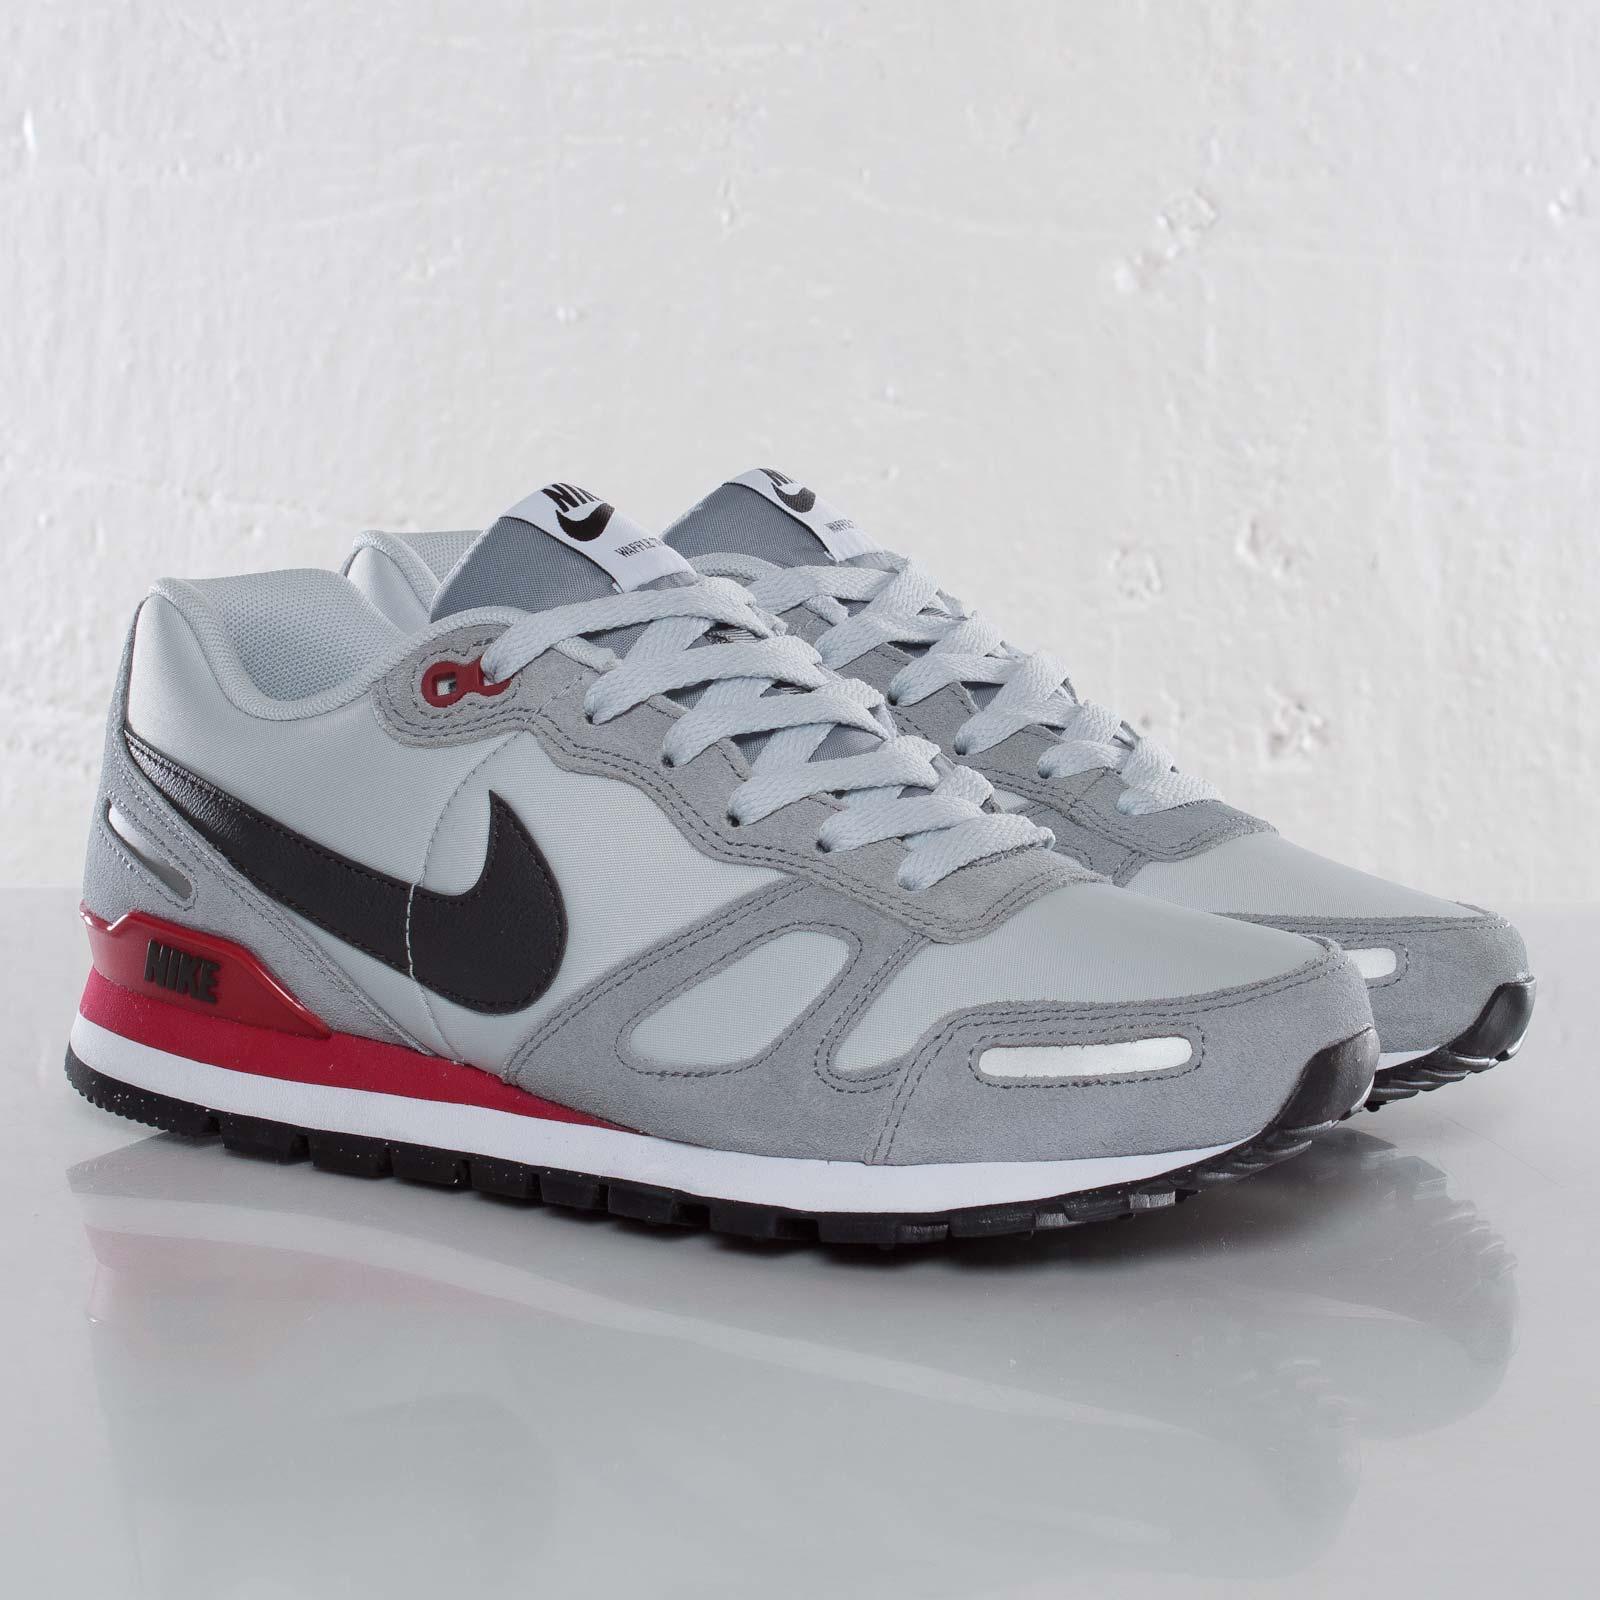 Nike Air Waffle Trainer - 429628-013